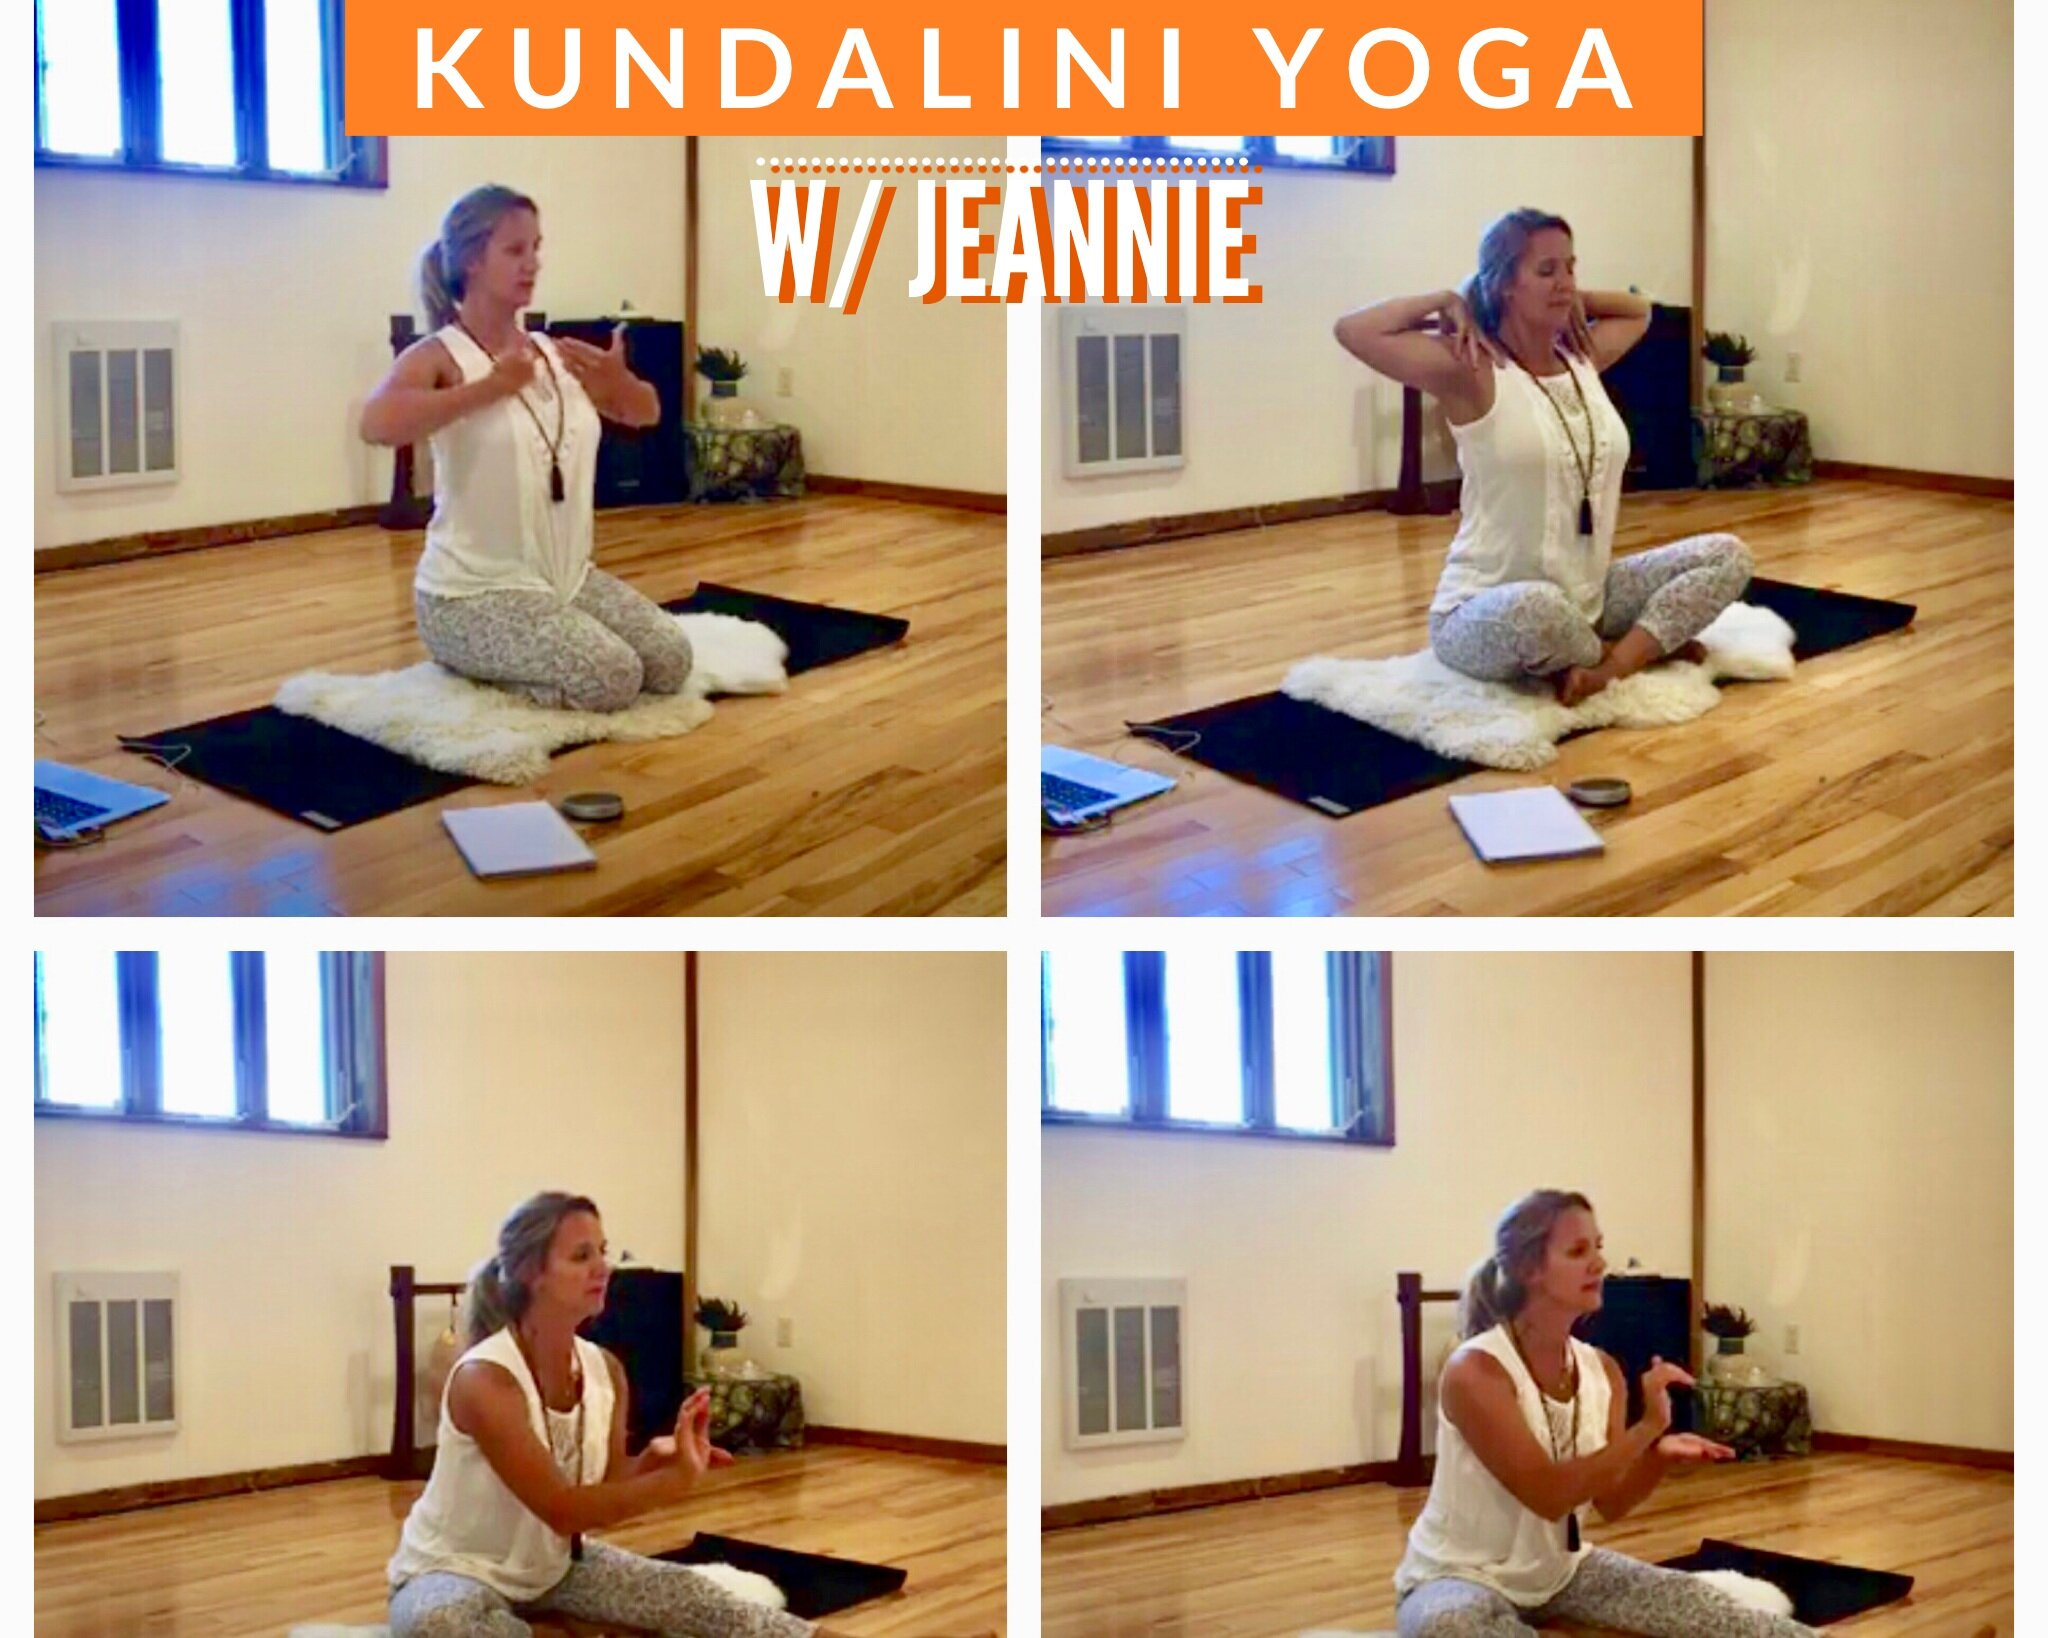 Kundalini Yoga Course Online Self Guided 6 Week Course Yoga Farm Ithaca